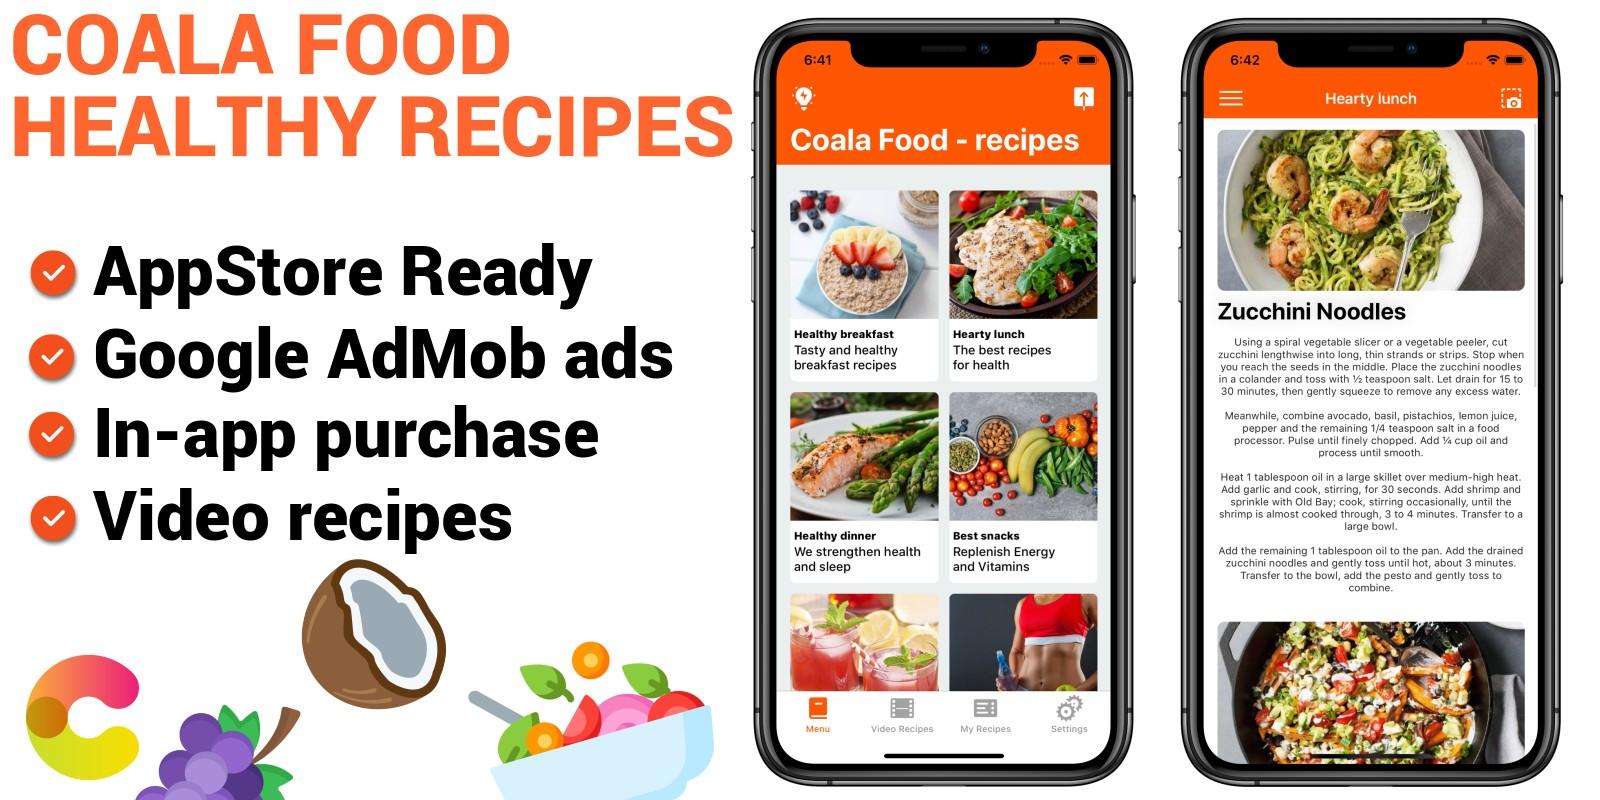 Coala Food - iOS Food Recipes App